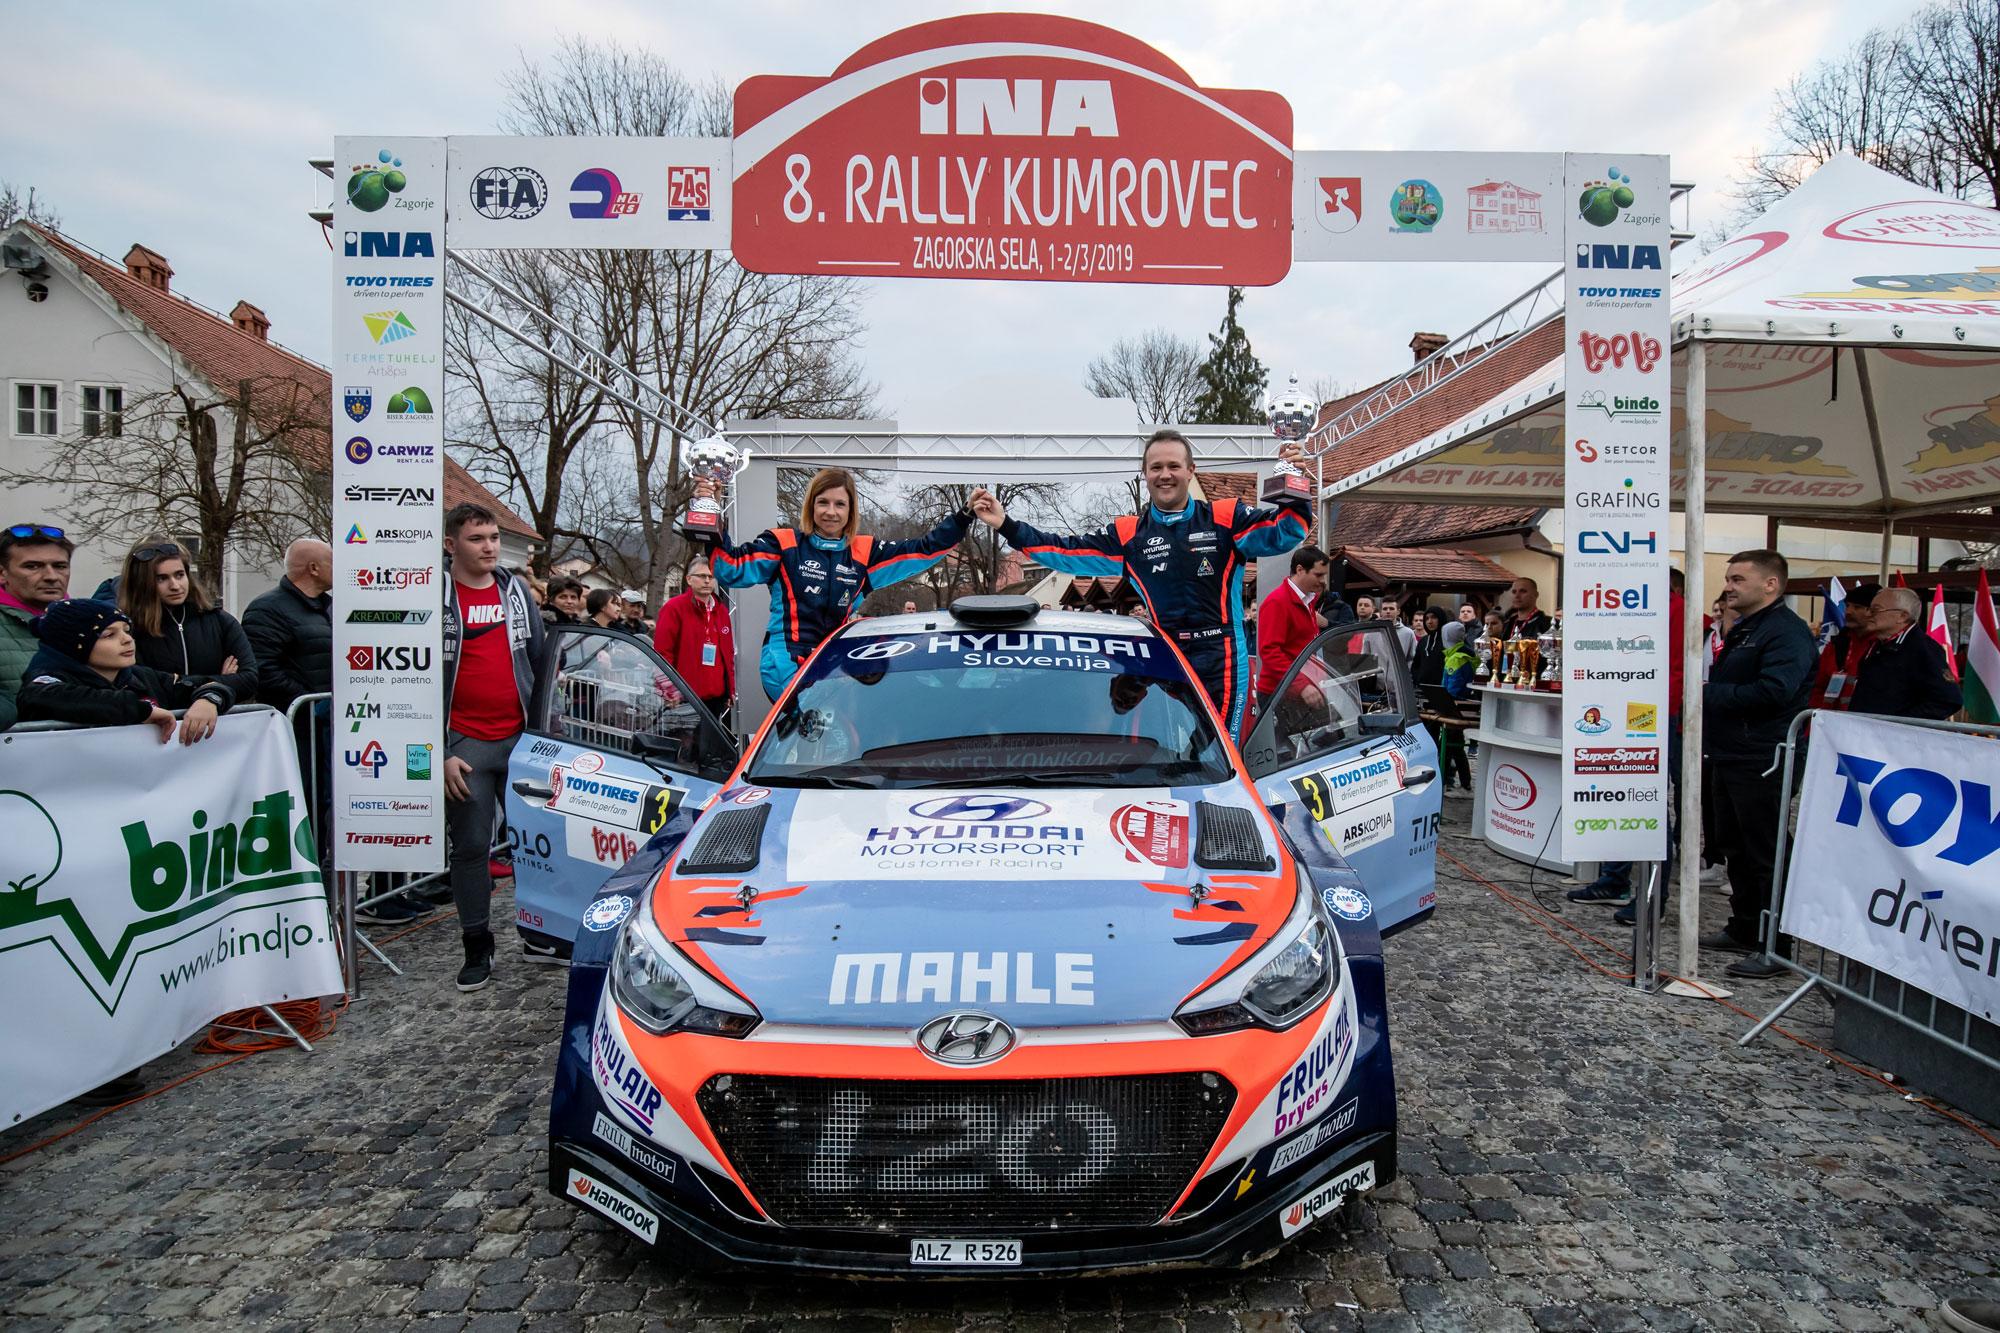 Rok Turk - i20 R5 - Rally Kumrovec